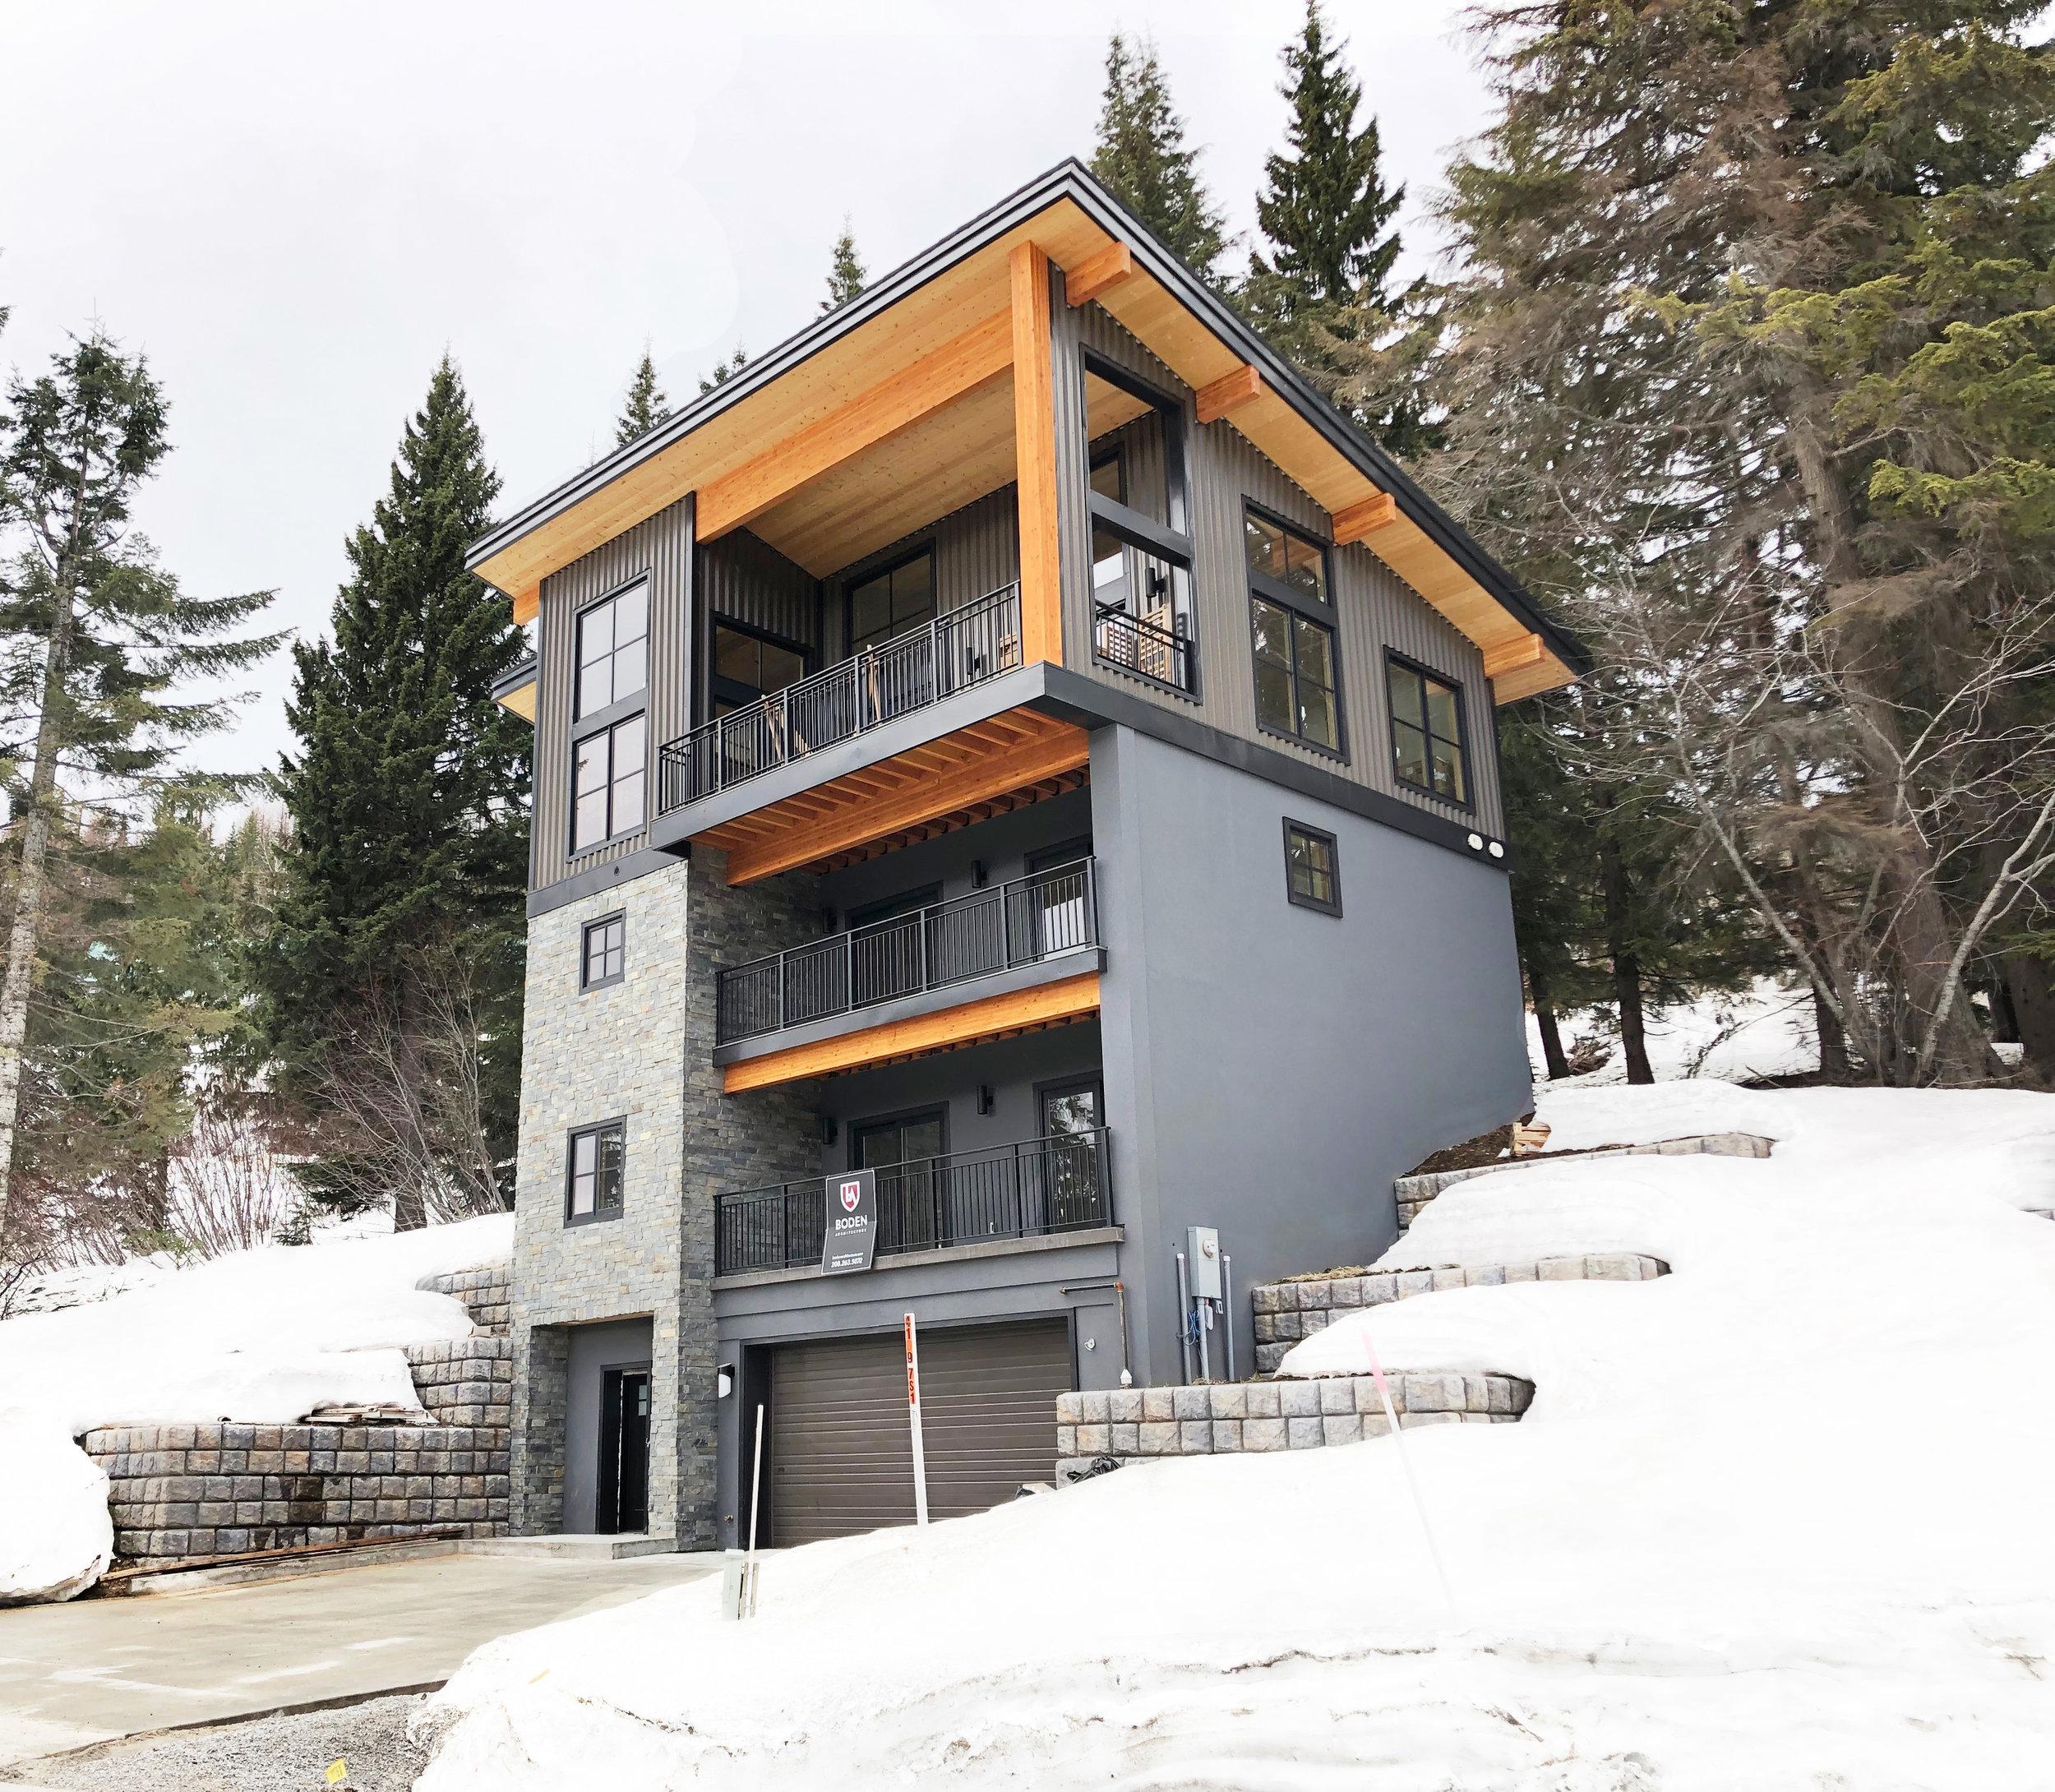 1_Exterior-Schweitzer-Residence-Mountain-Snow.jpg